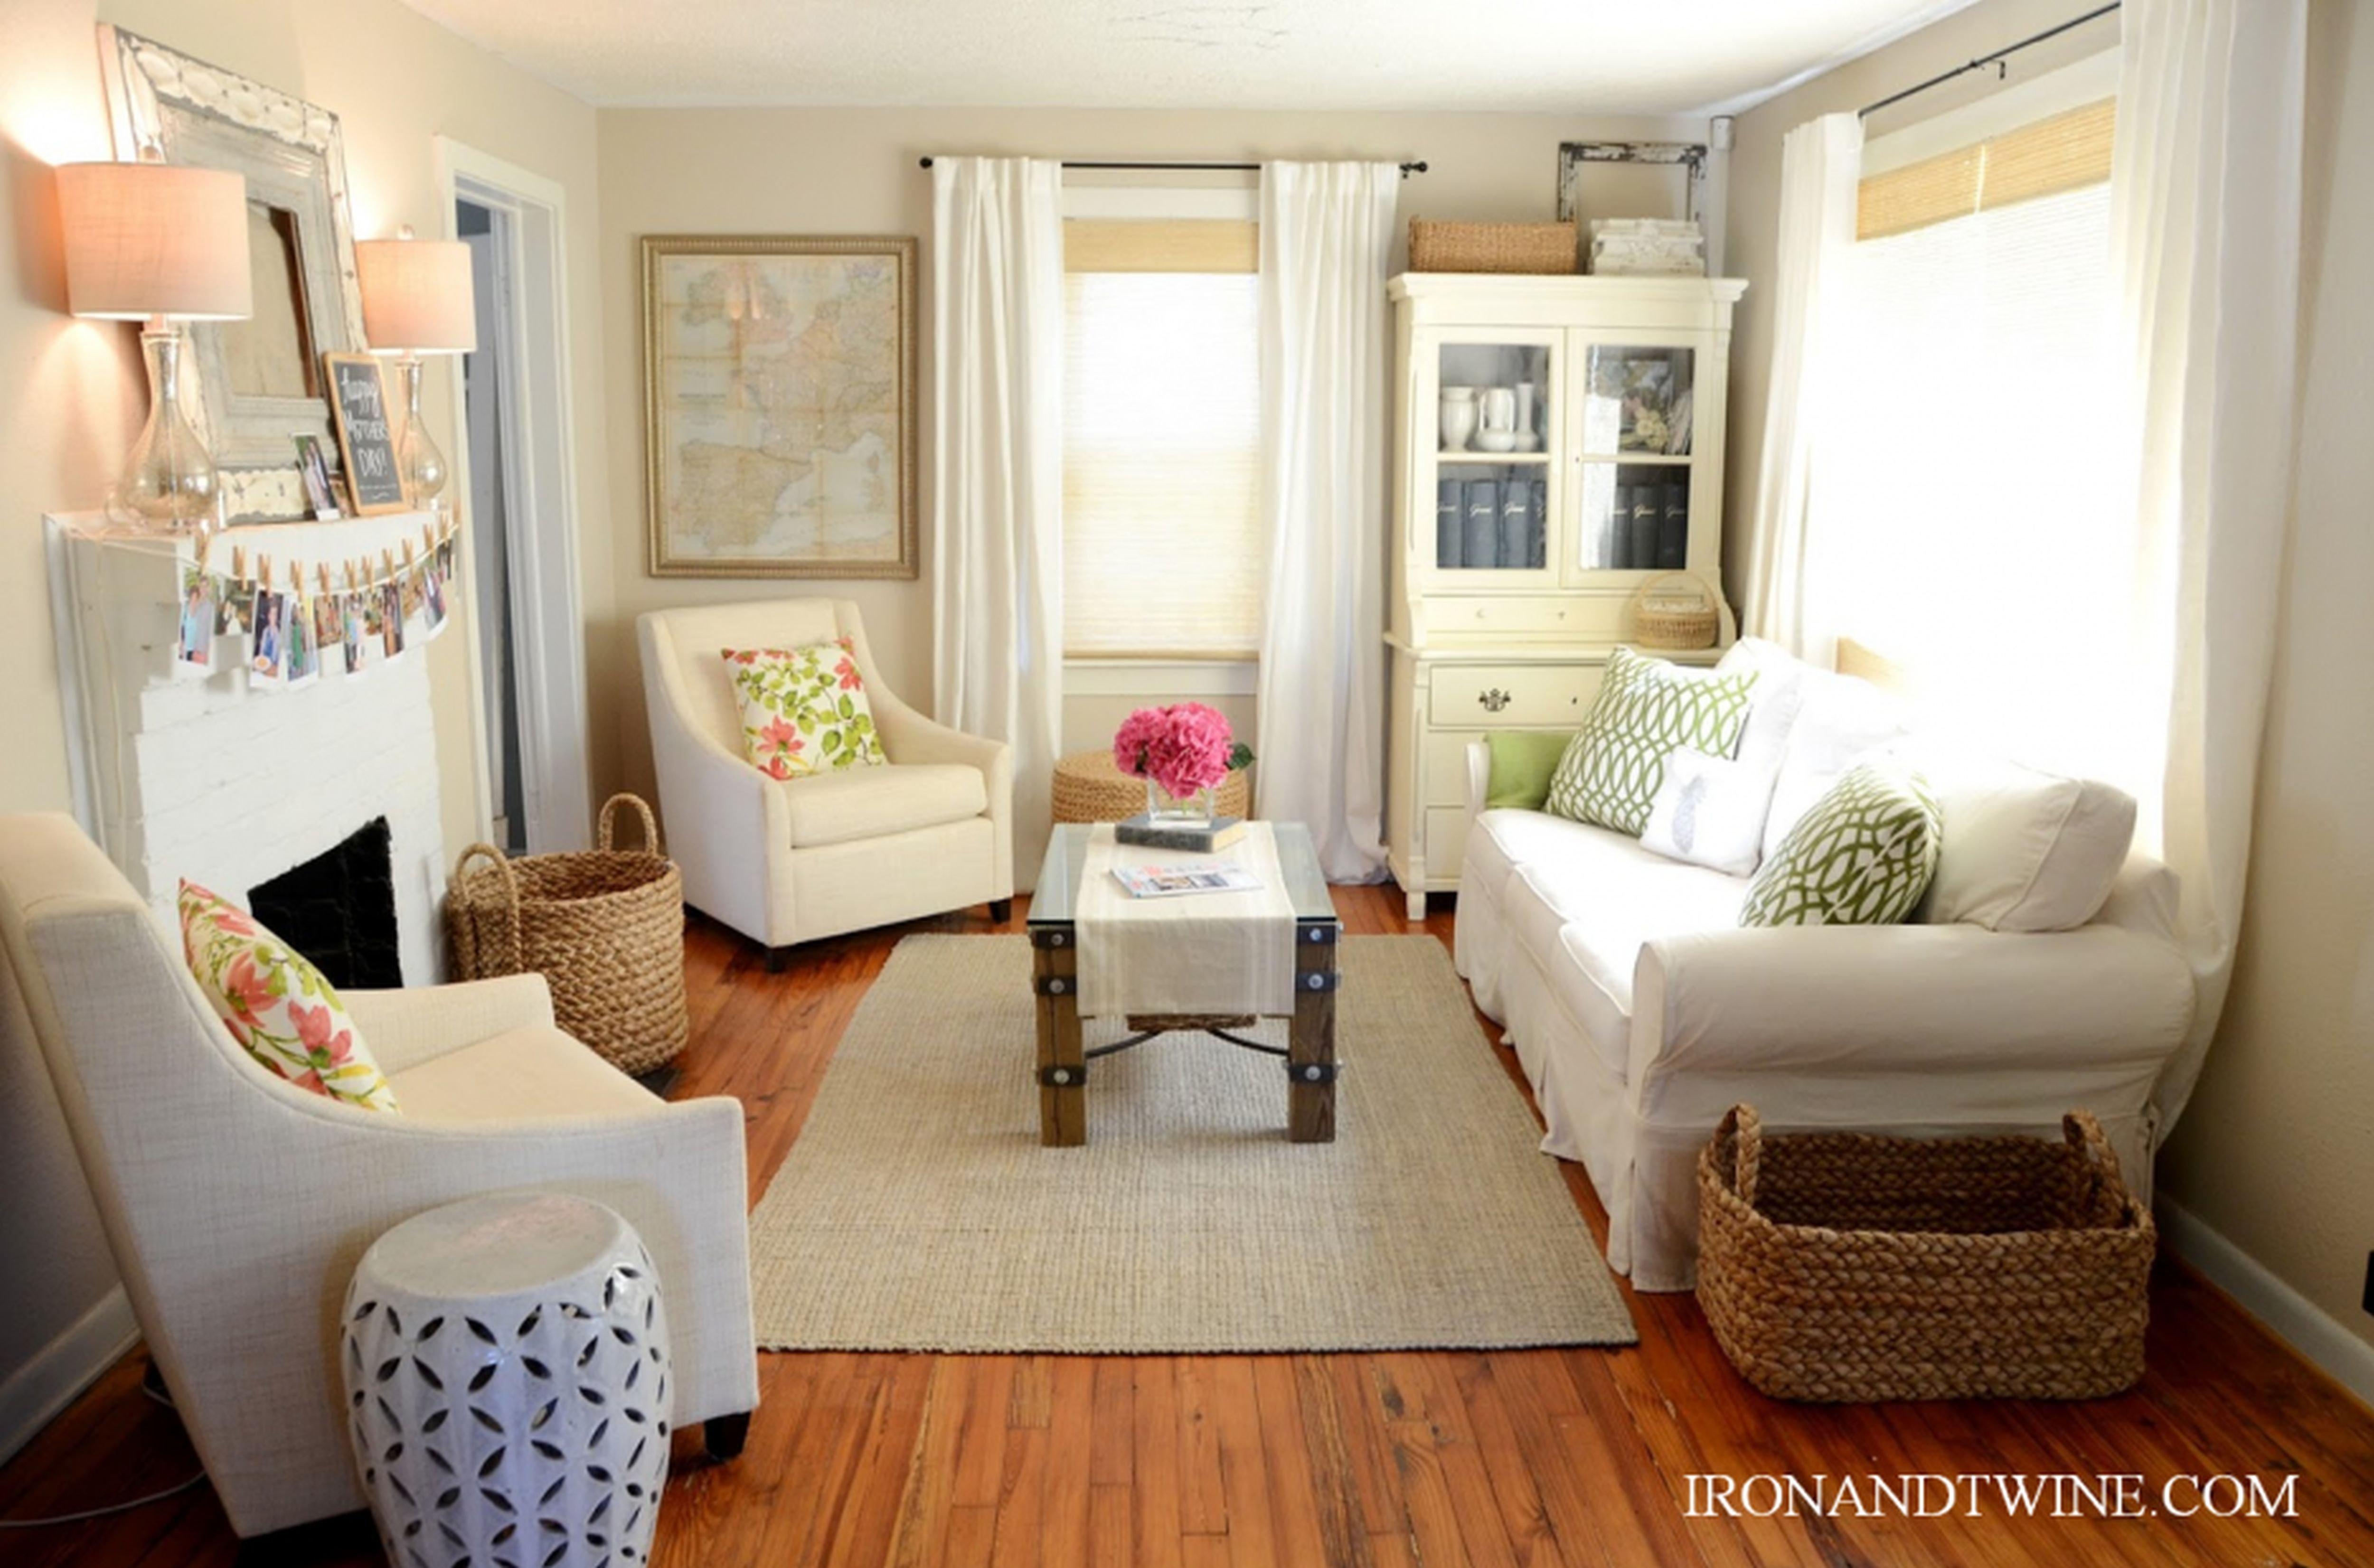 10 Nice Small Apartment Living Room Ideas decorate small apartment living room amusing apartment living room 2020